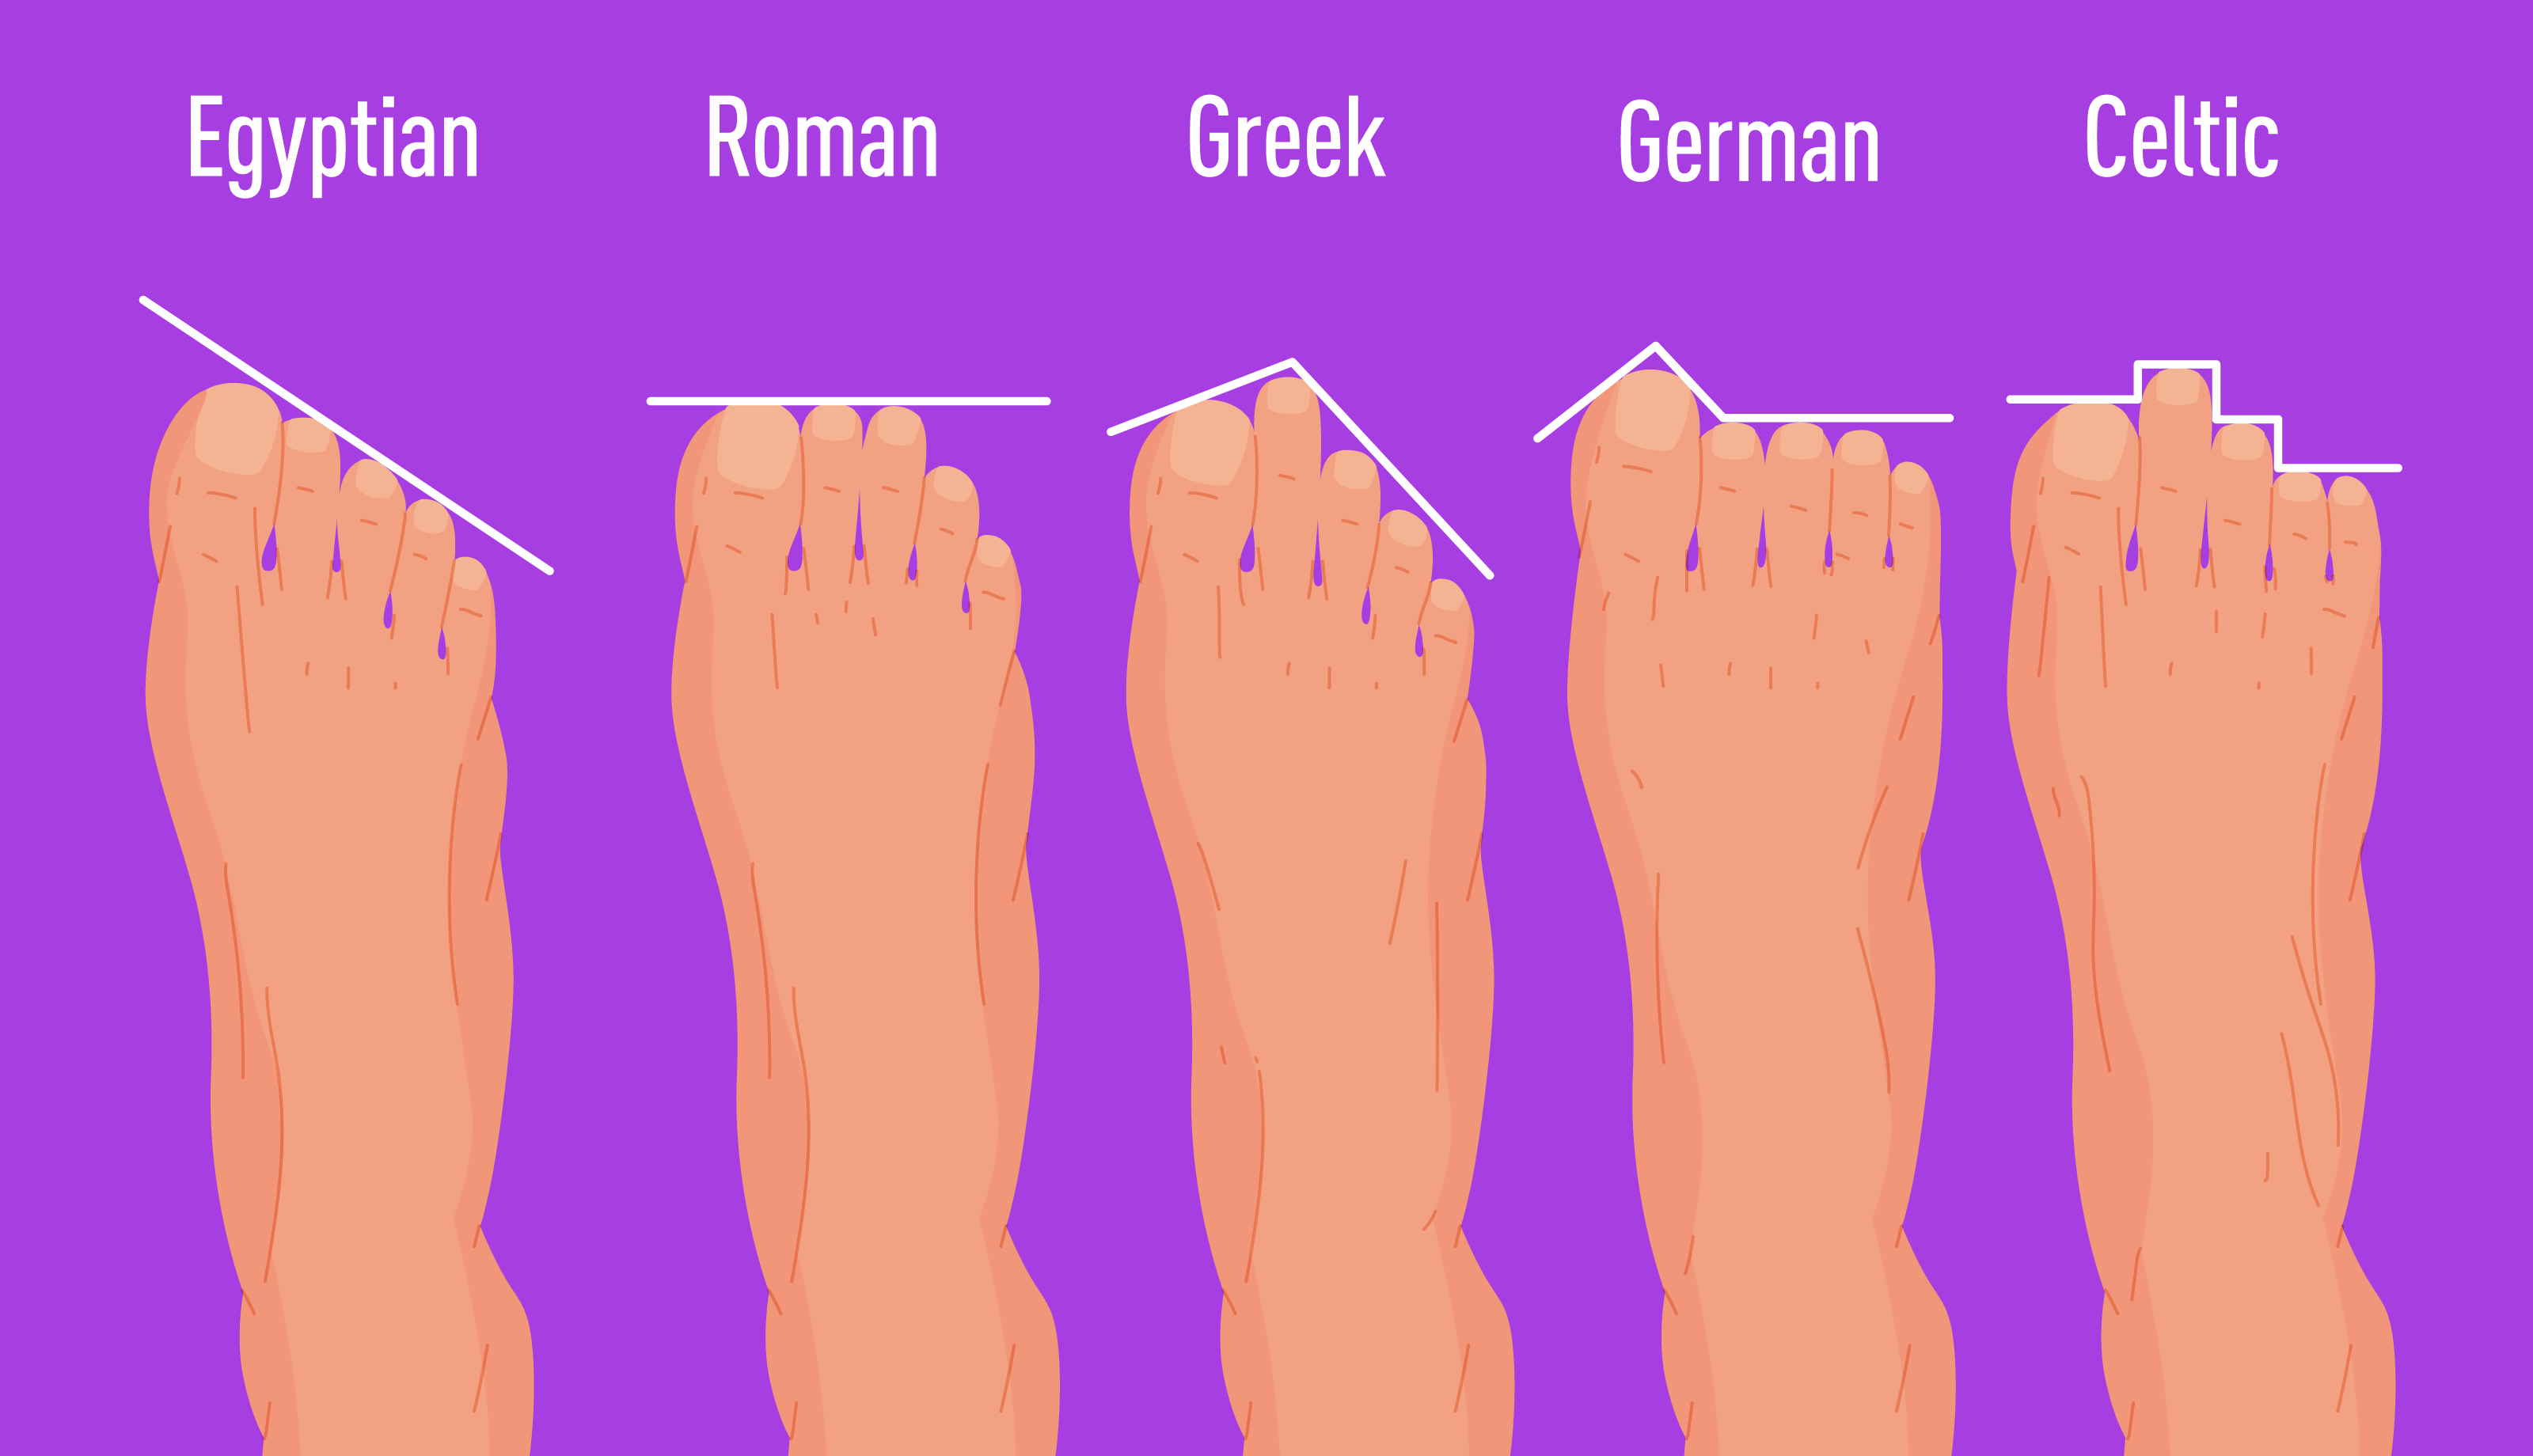 2020-08-20-1-Feet-genom-caveman